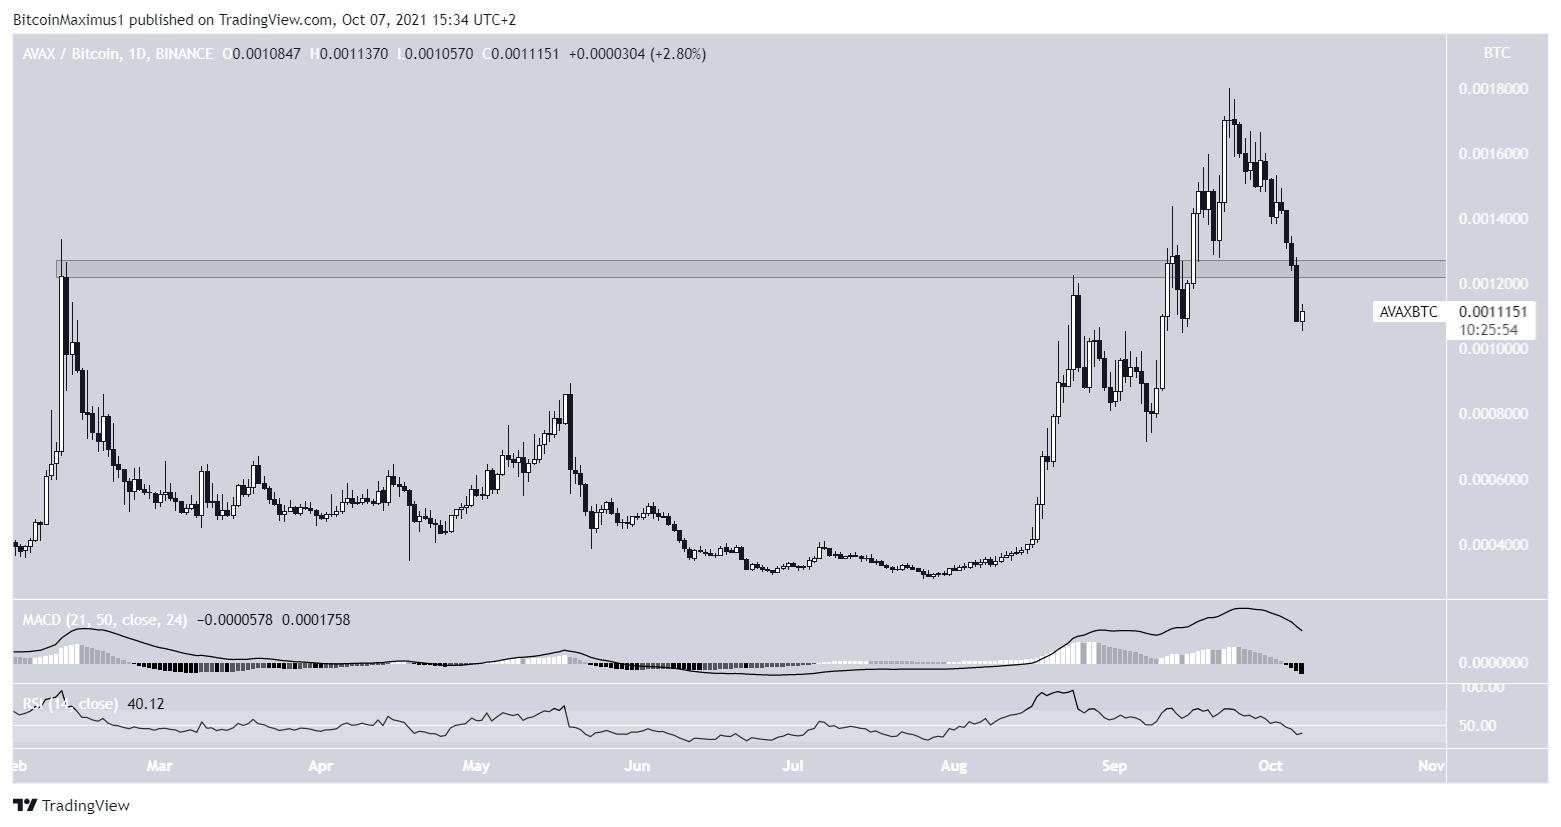 AVAX/BTC drop